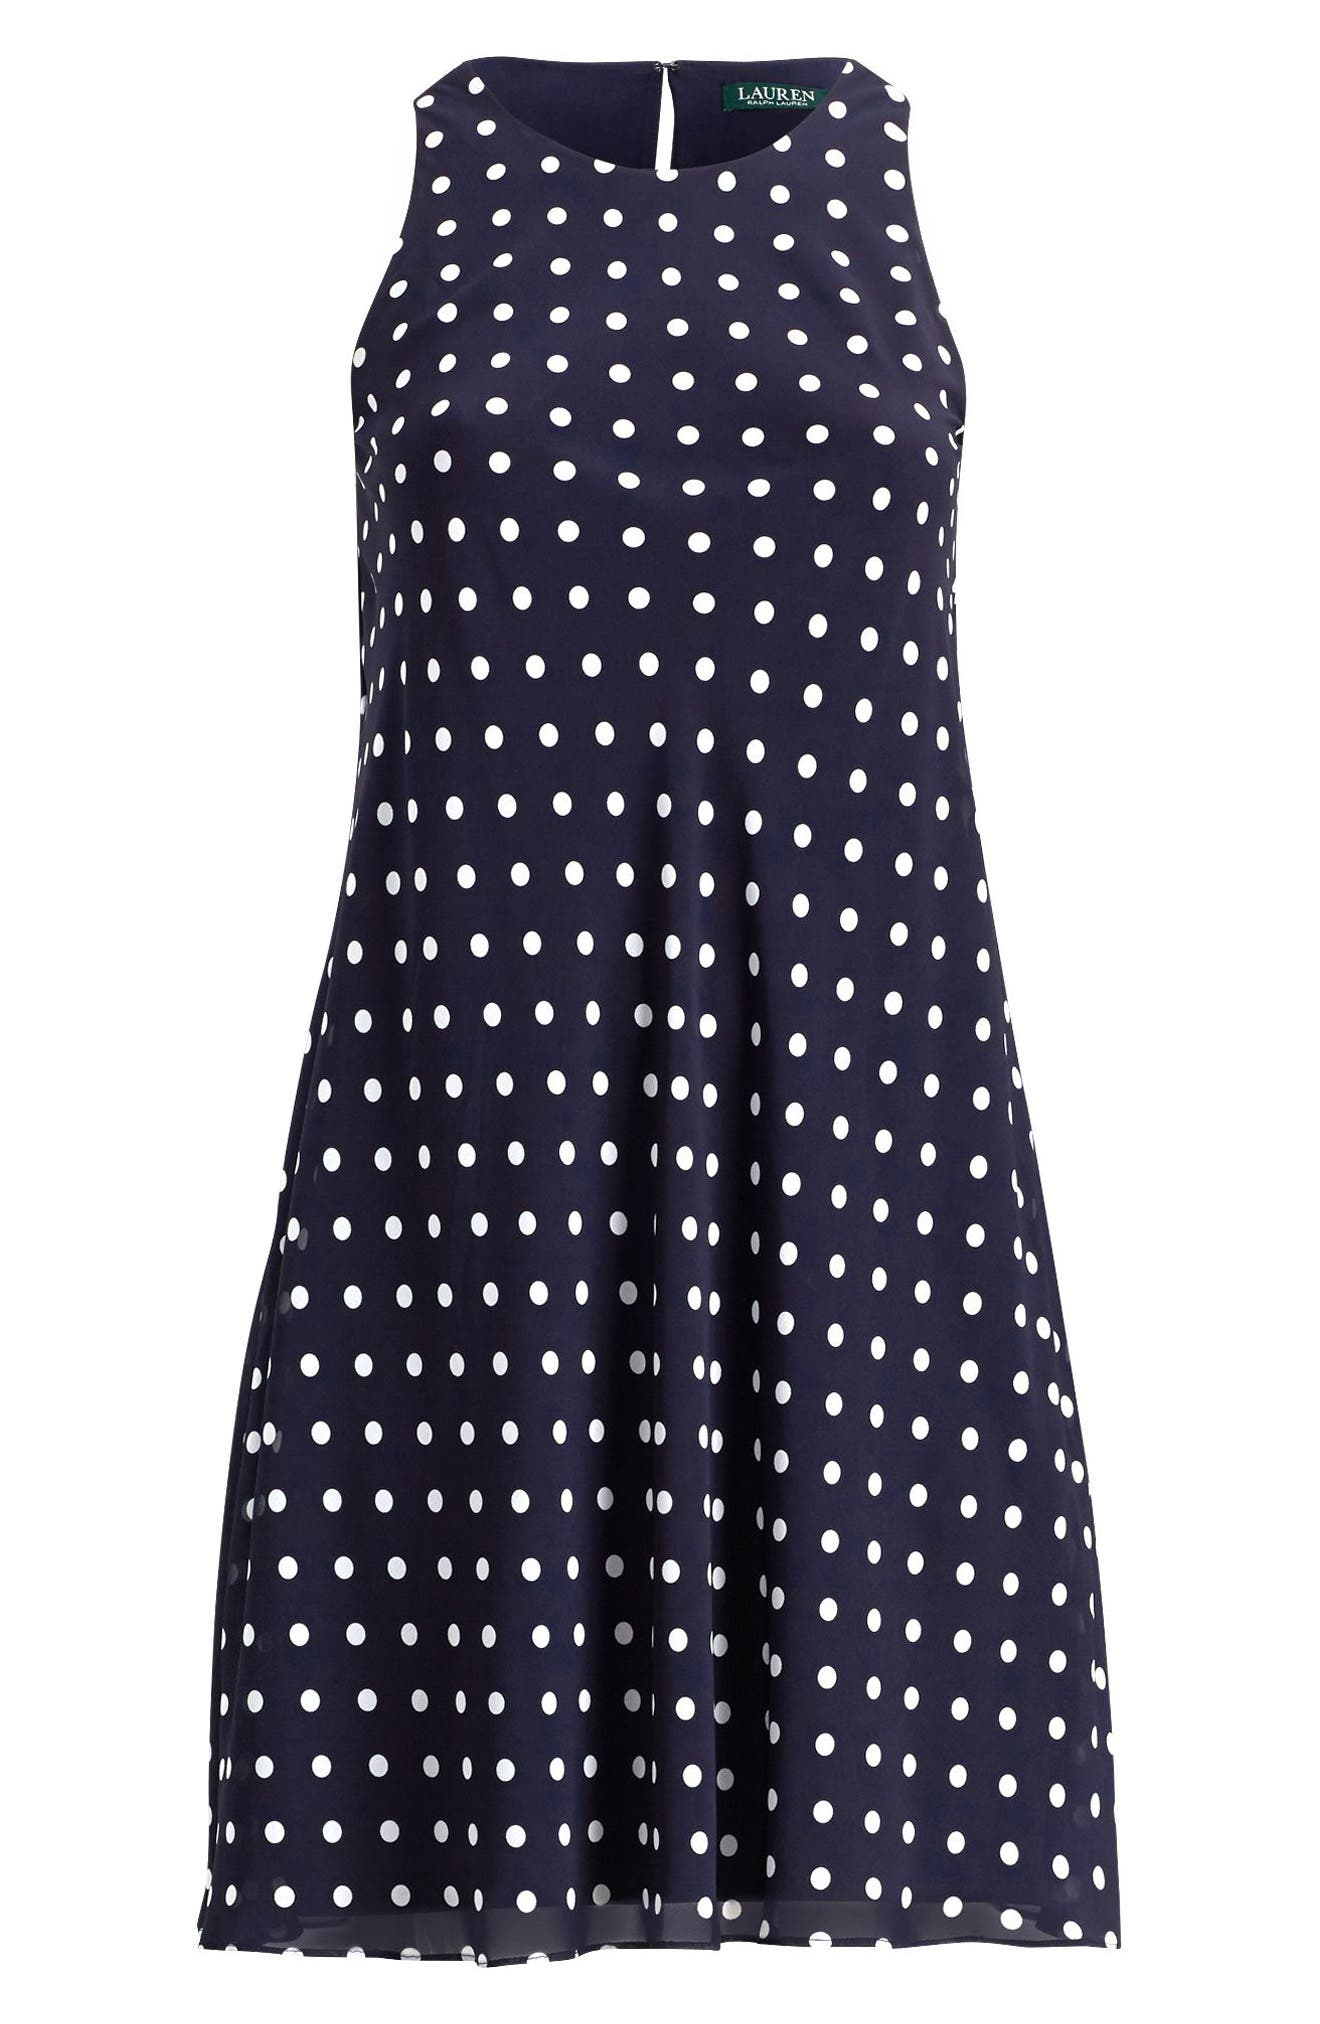 Polka Dot Dress,                             Alternate thumbnail 3, color,                             401